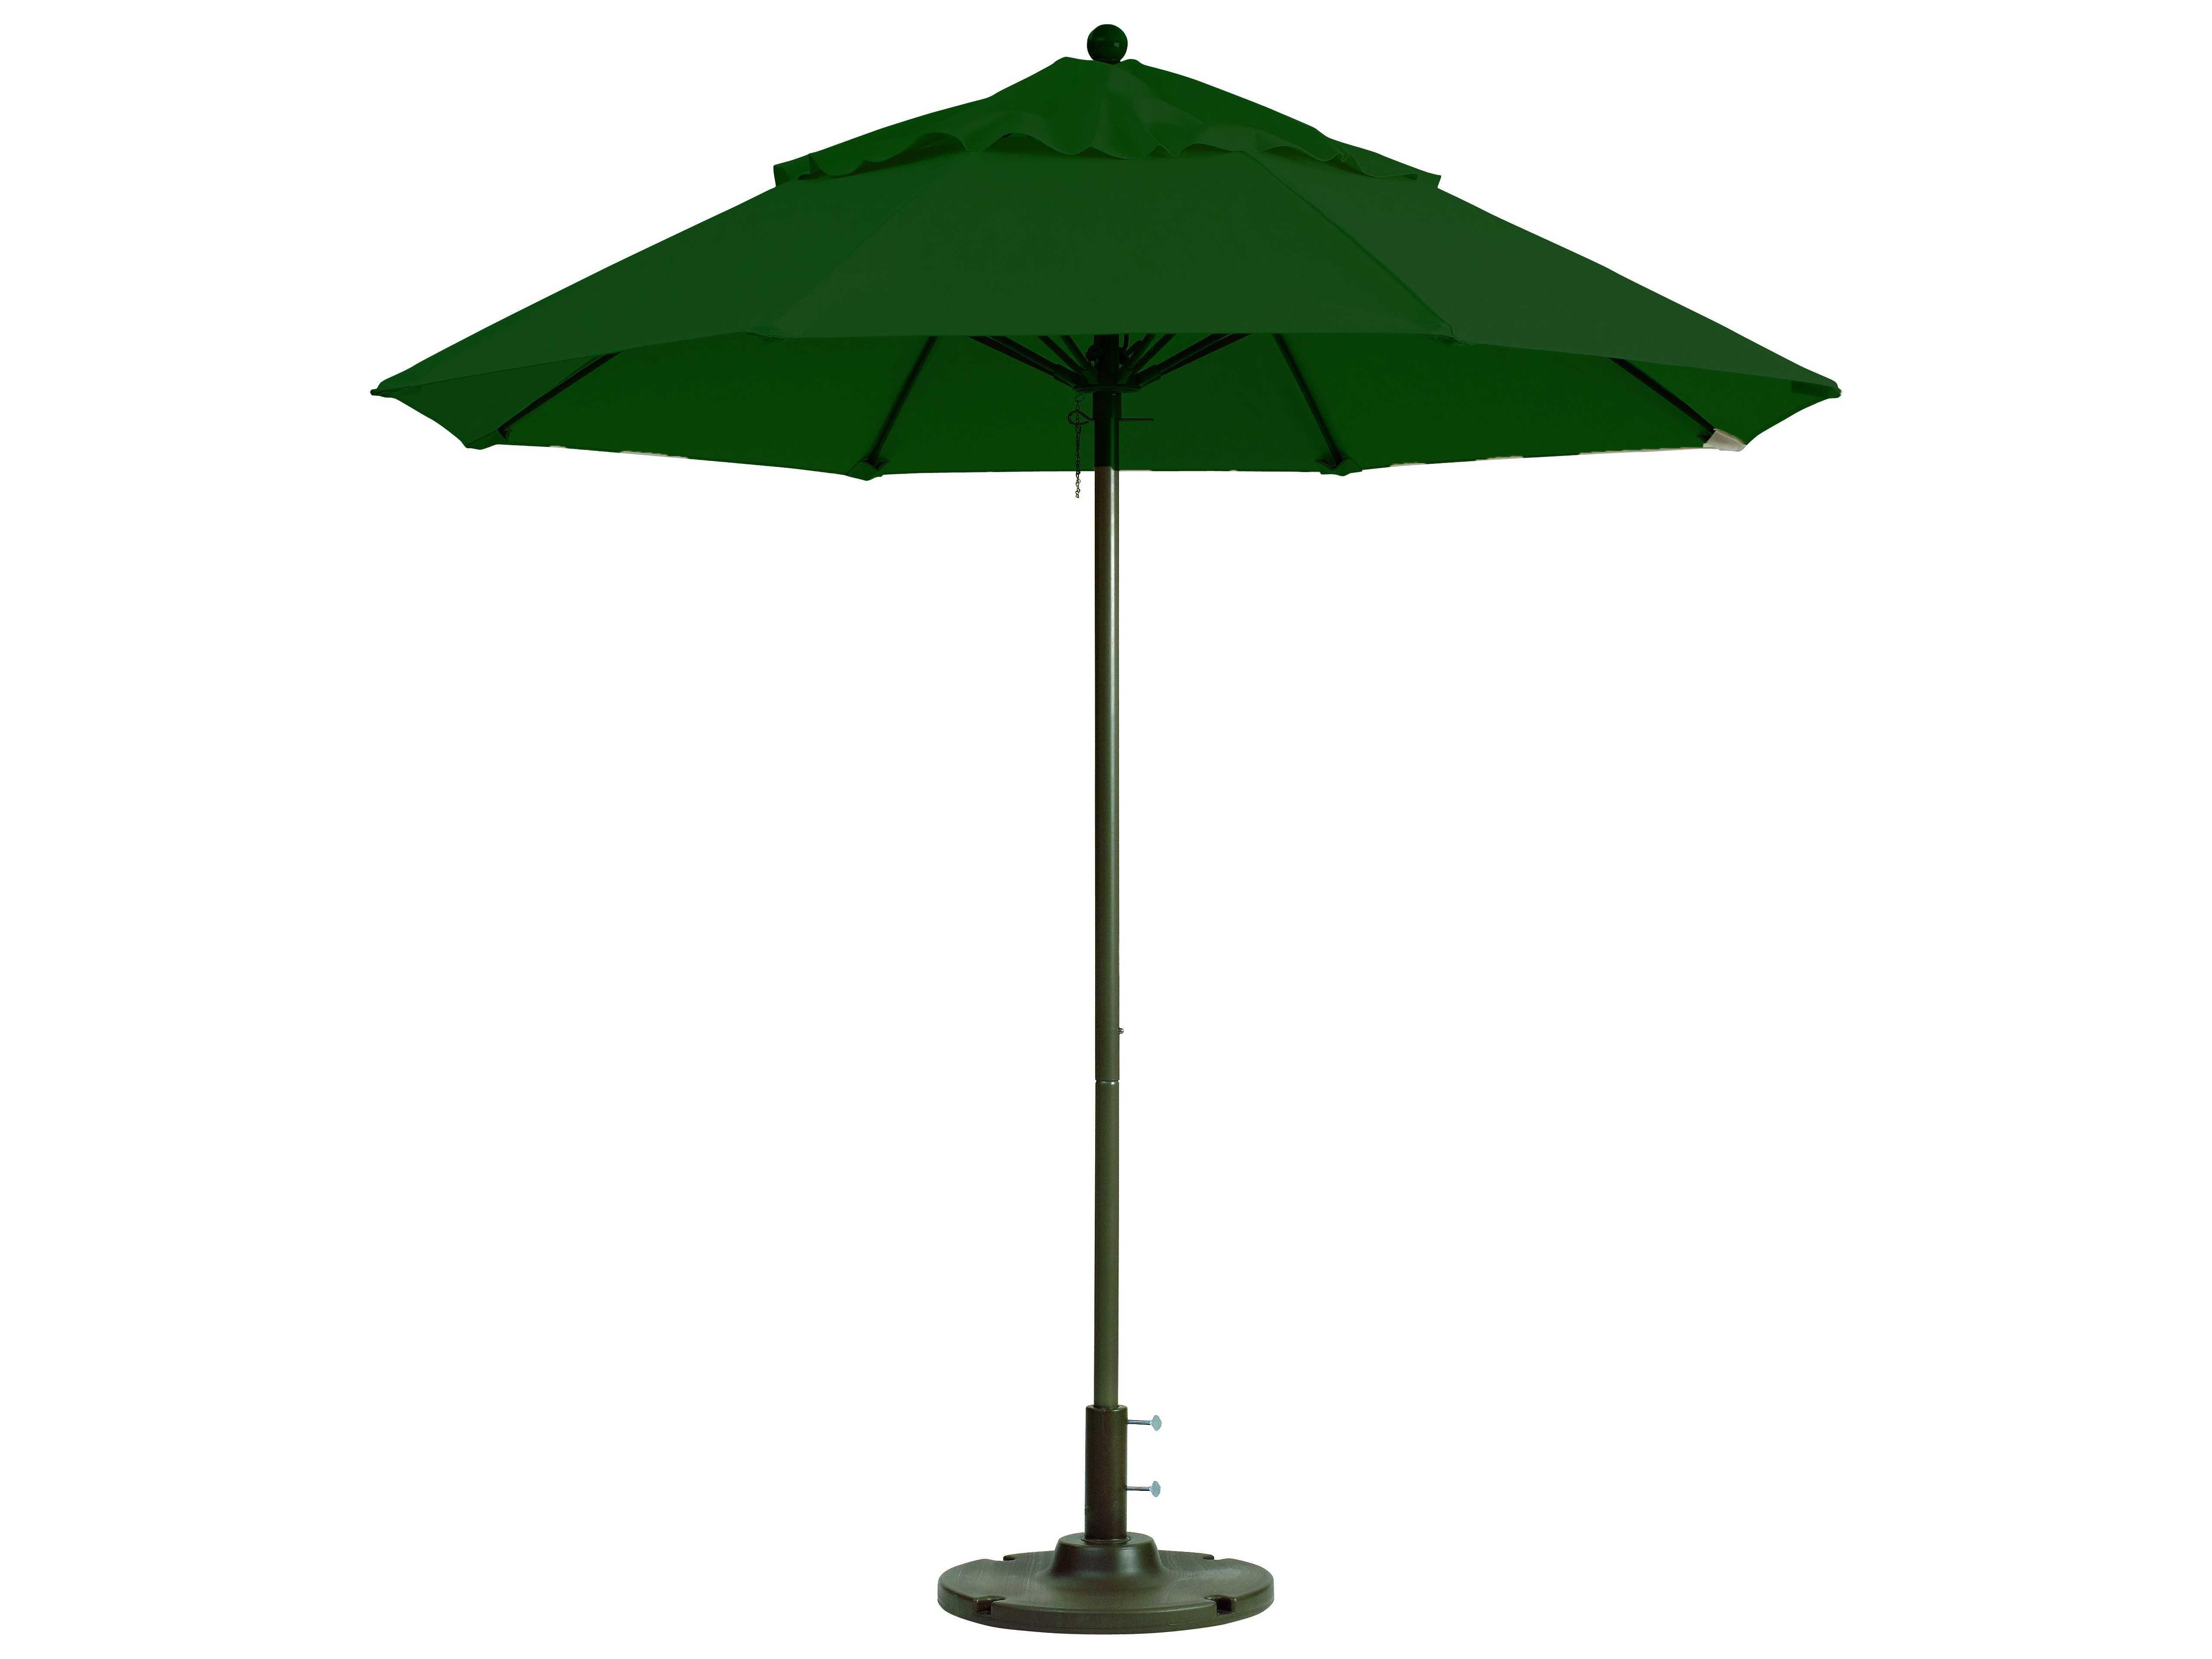 Grosfillex Windmaster 9 Foot Fiberglass Umbrella 98822031